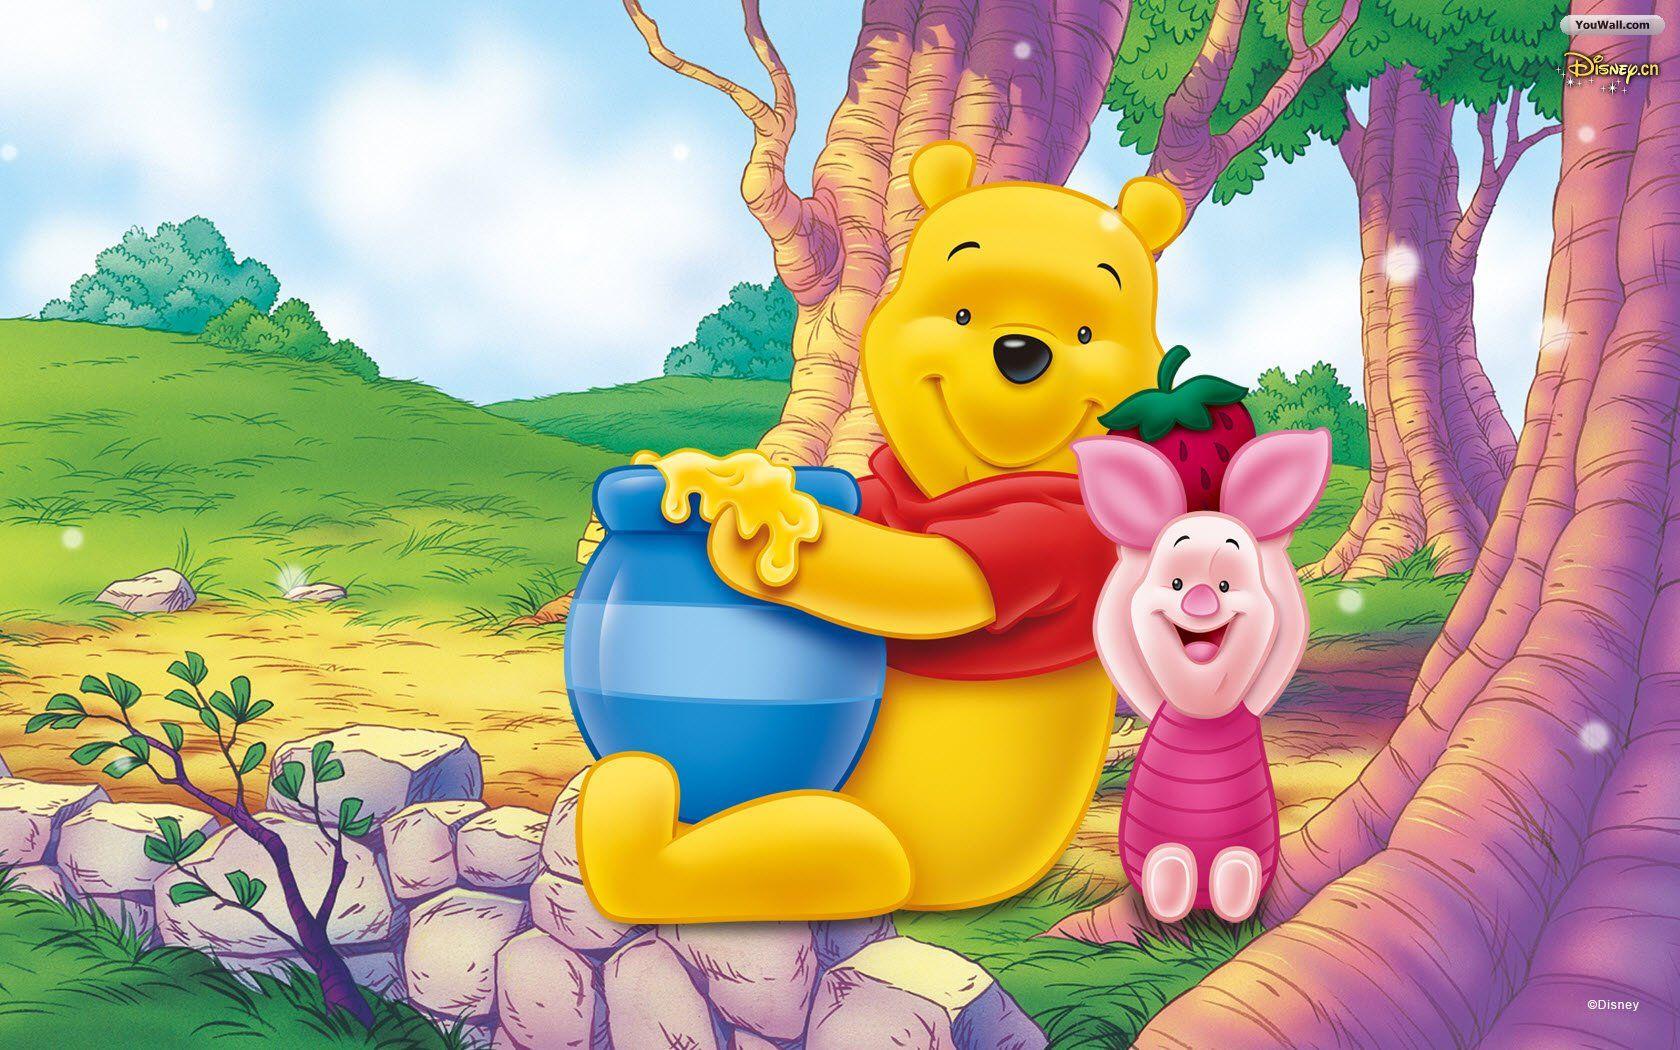 Winnie The Pooh And Friends Wallpaper Youwall Winnie Pooh